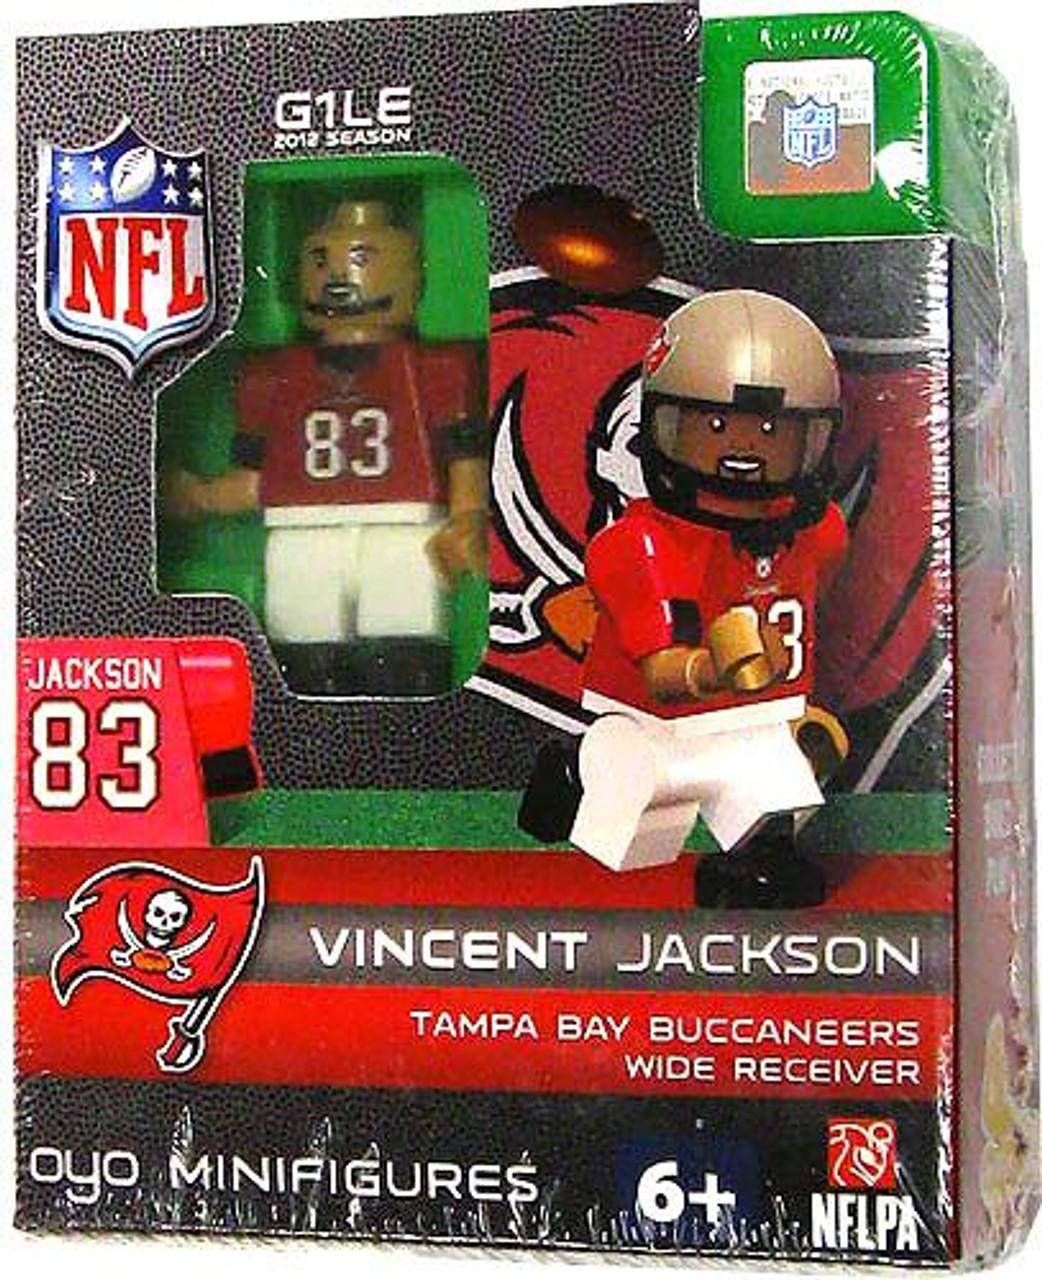 Tampa Bay Buccaneers NFL Generation 1 2012 Season Vincent Jackson Minifigure